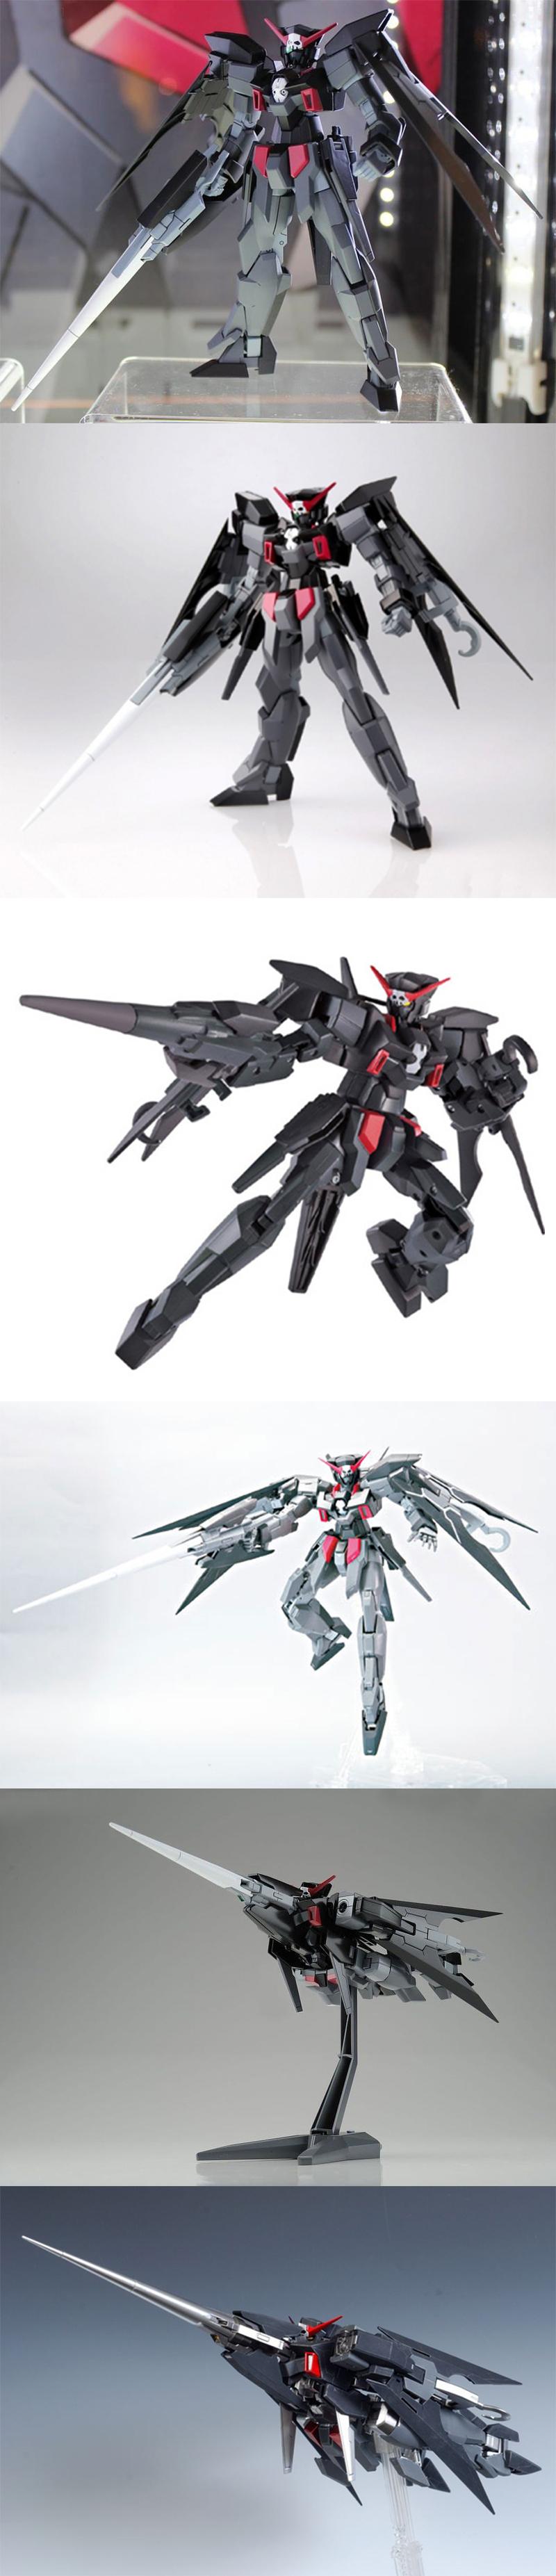 【模型王】BANDAI 鋼彈AGE HG 1/144 #24 GUNDAM AGE-2 DARK HOUND 黑獵犬